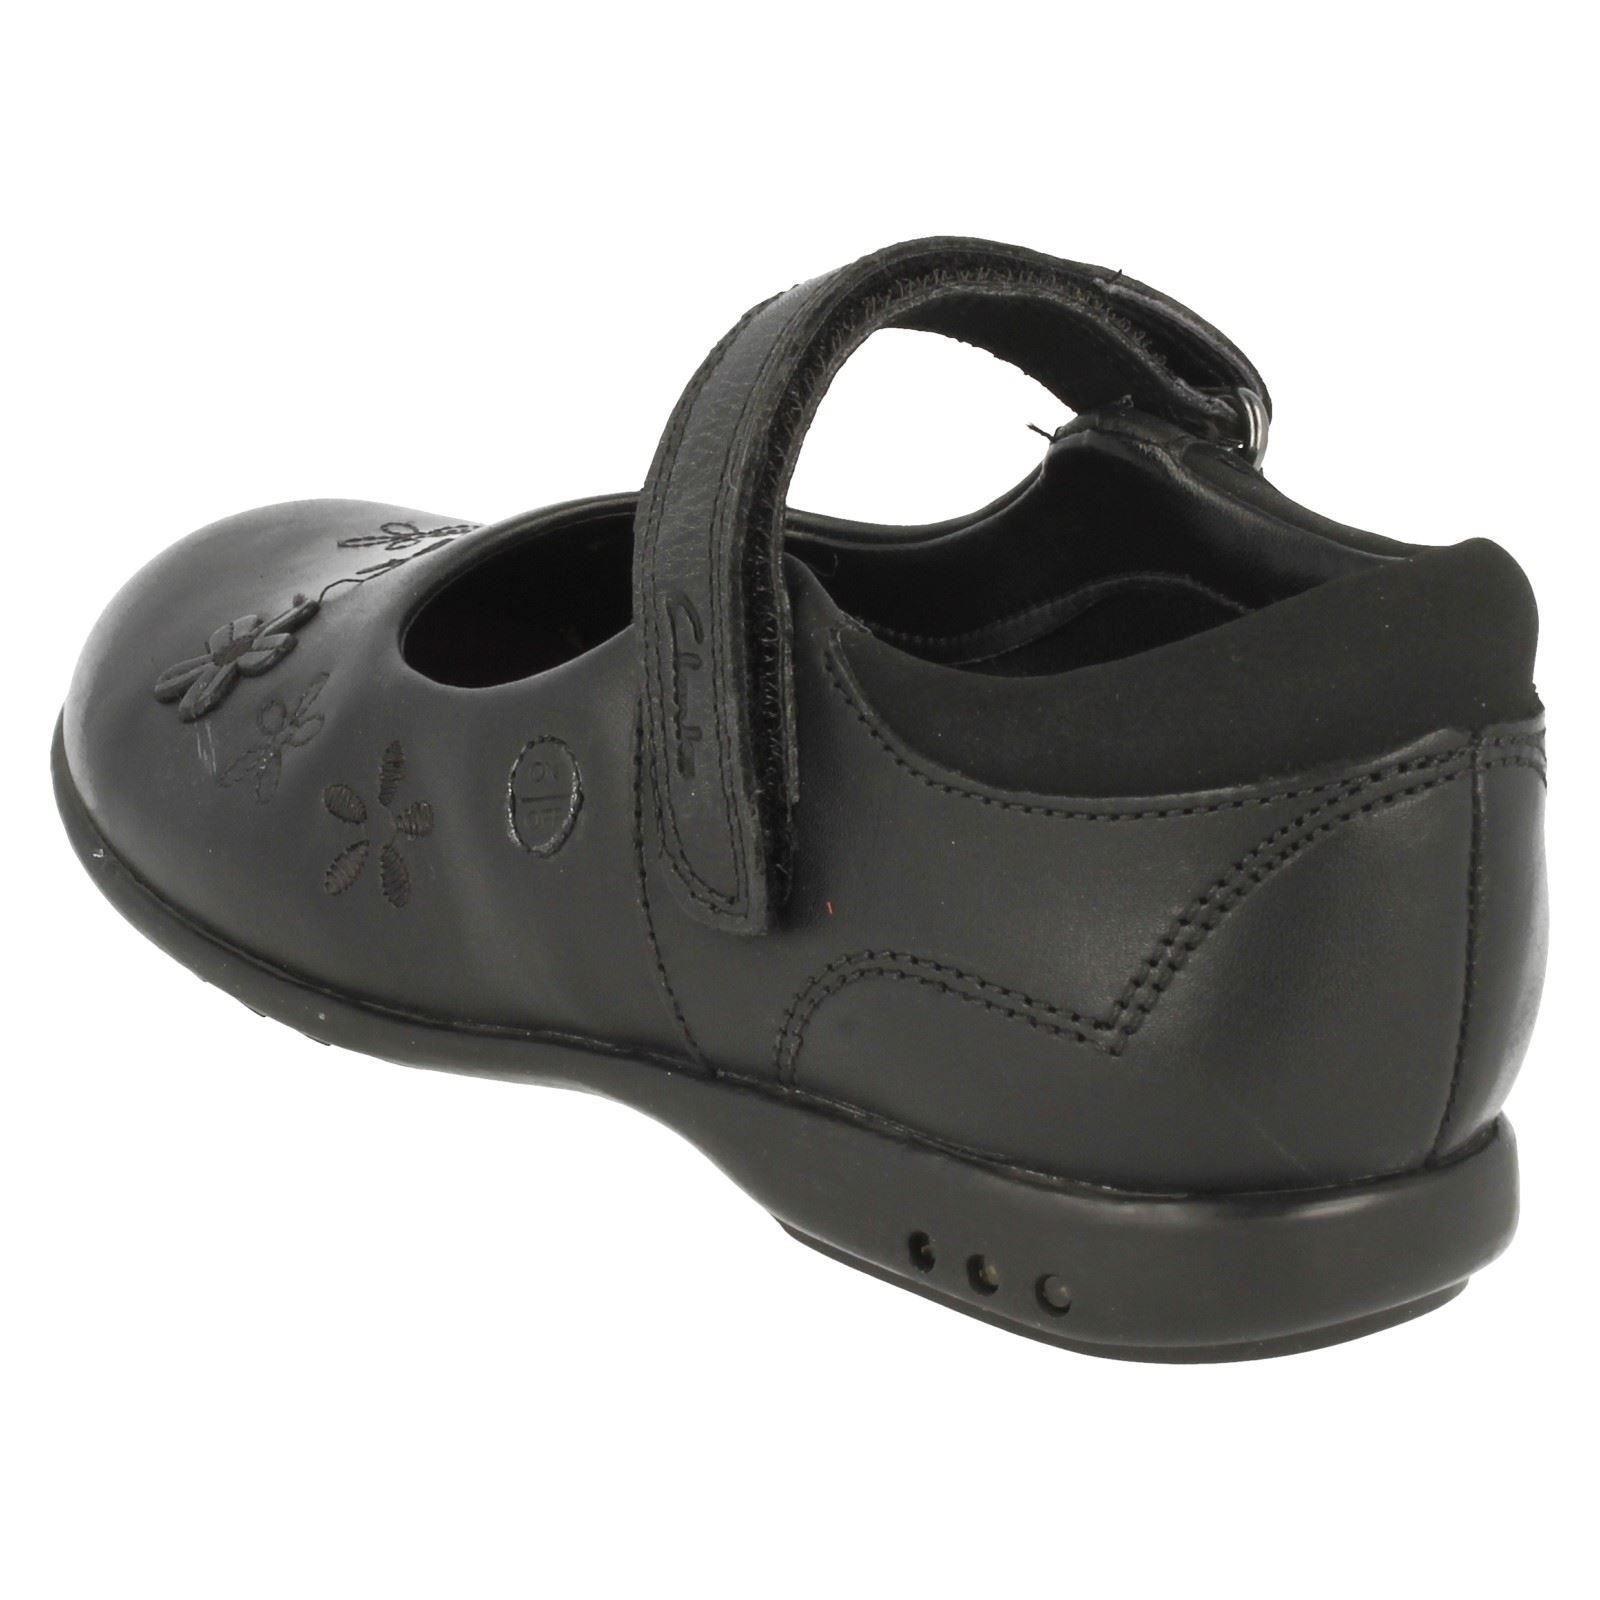 Clarks Girls Riptape Fastening School Shoes Breena Toes